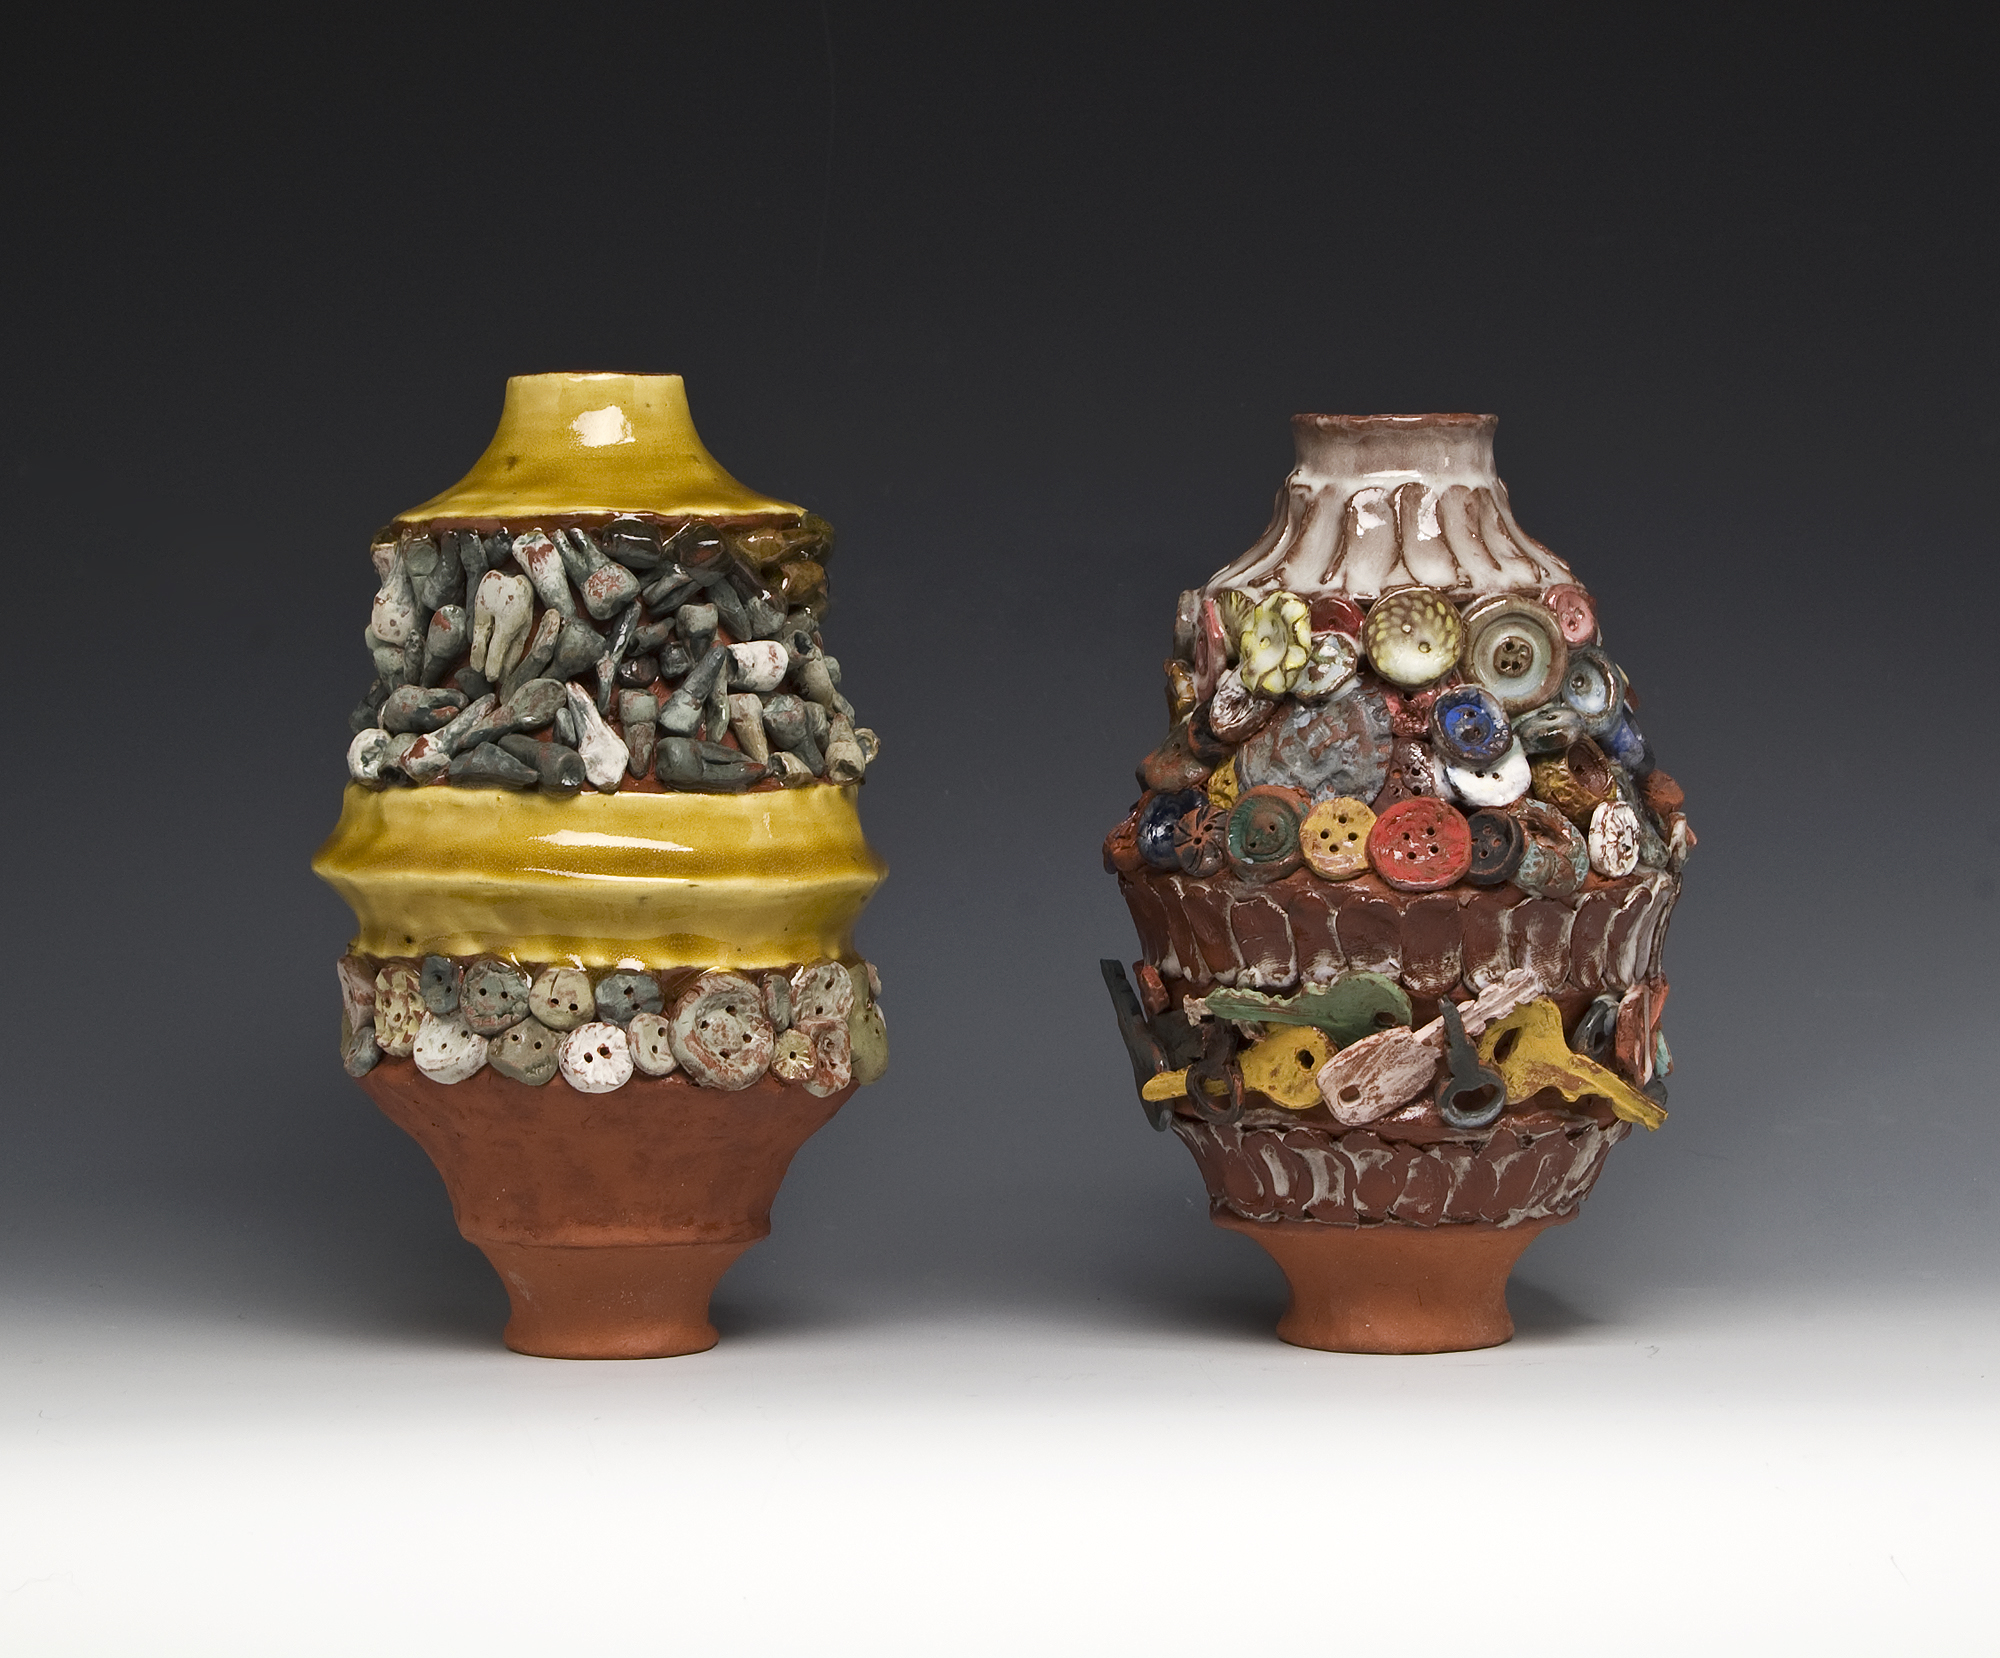 laurensandler1_Attached Absences, handbuilt earthenware with glaze.jpg